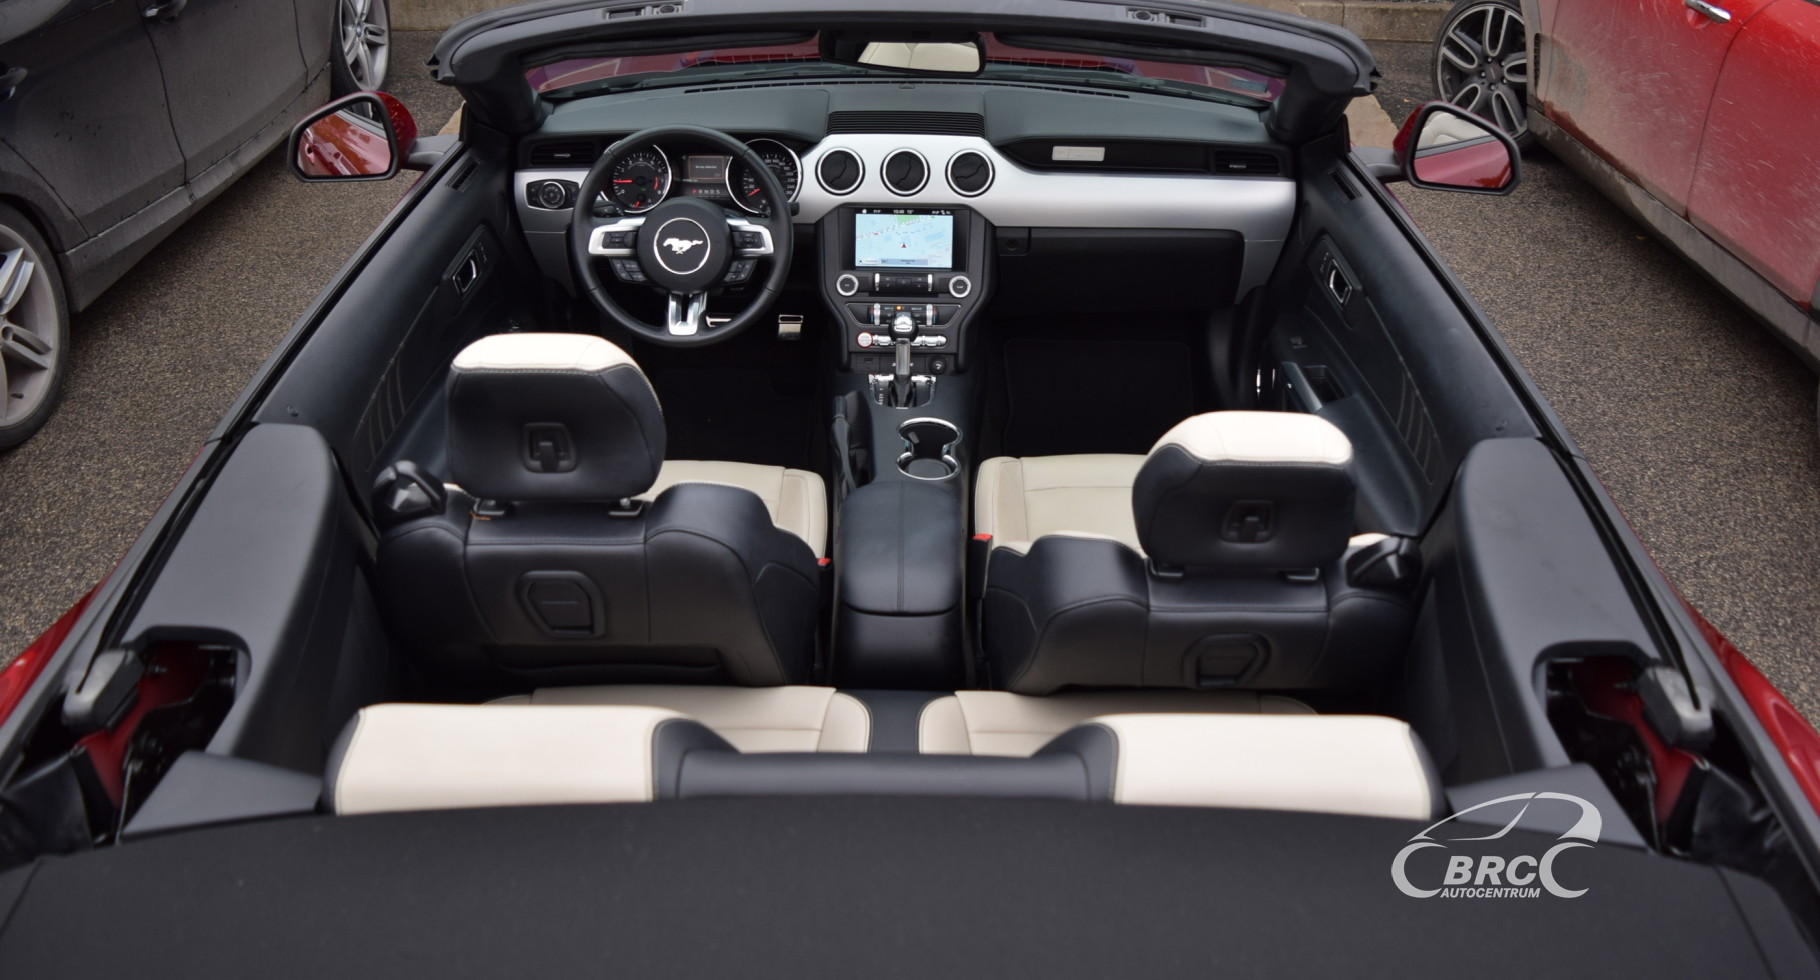 Ford Mustang Convertible EU version